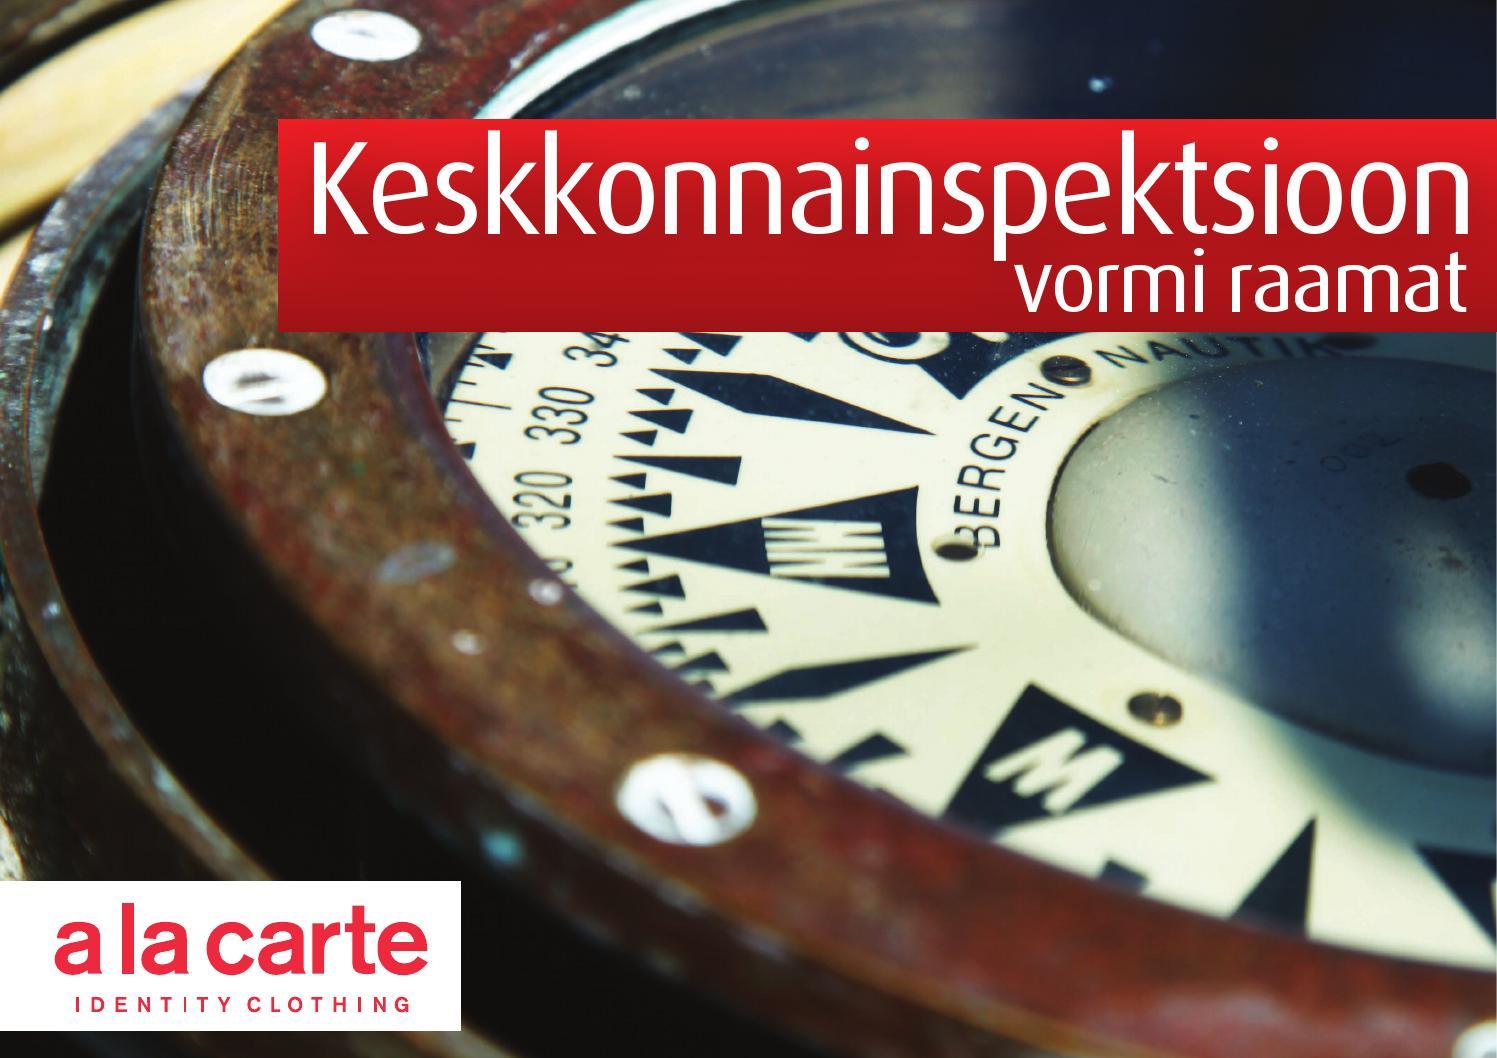 515985425fc KKI vormiraamat by A la Carte Uniforms - issuu